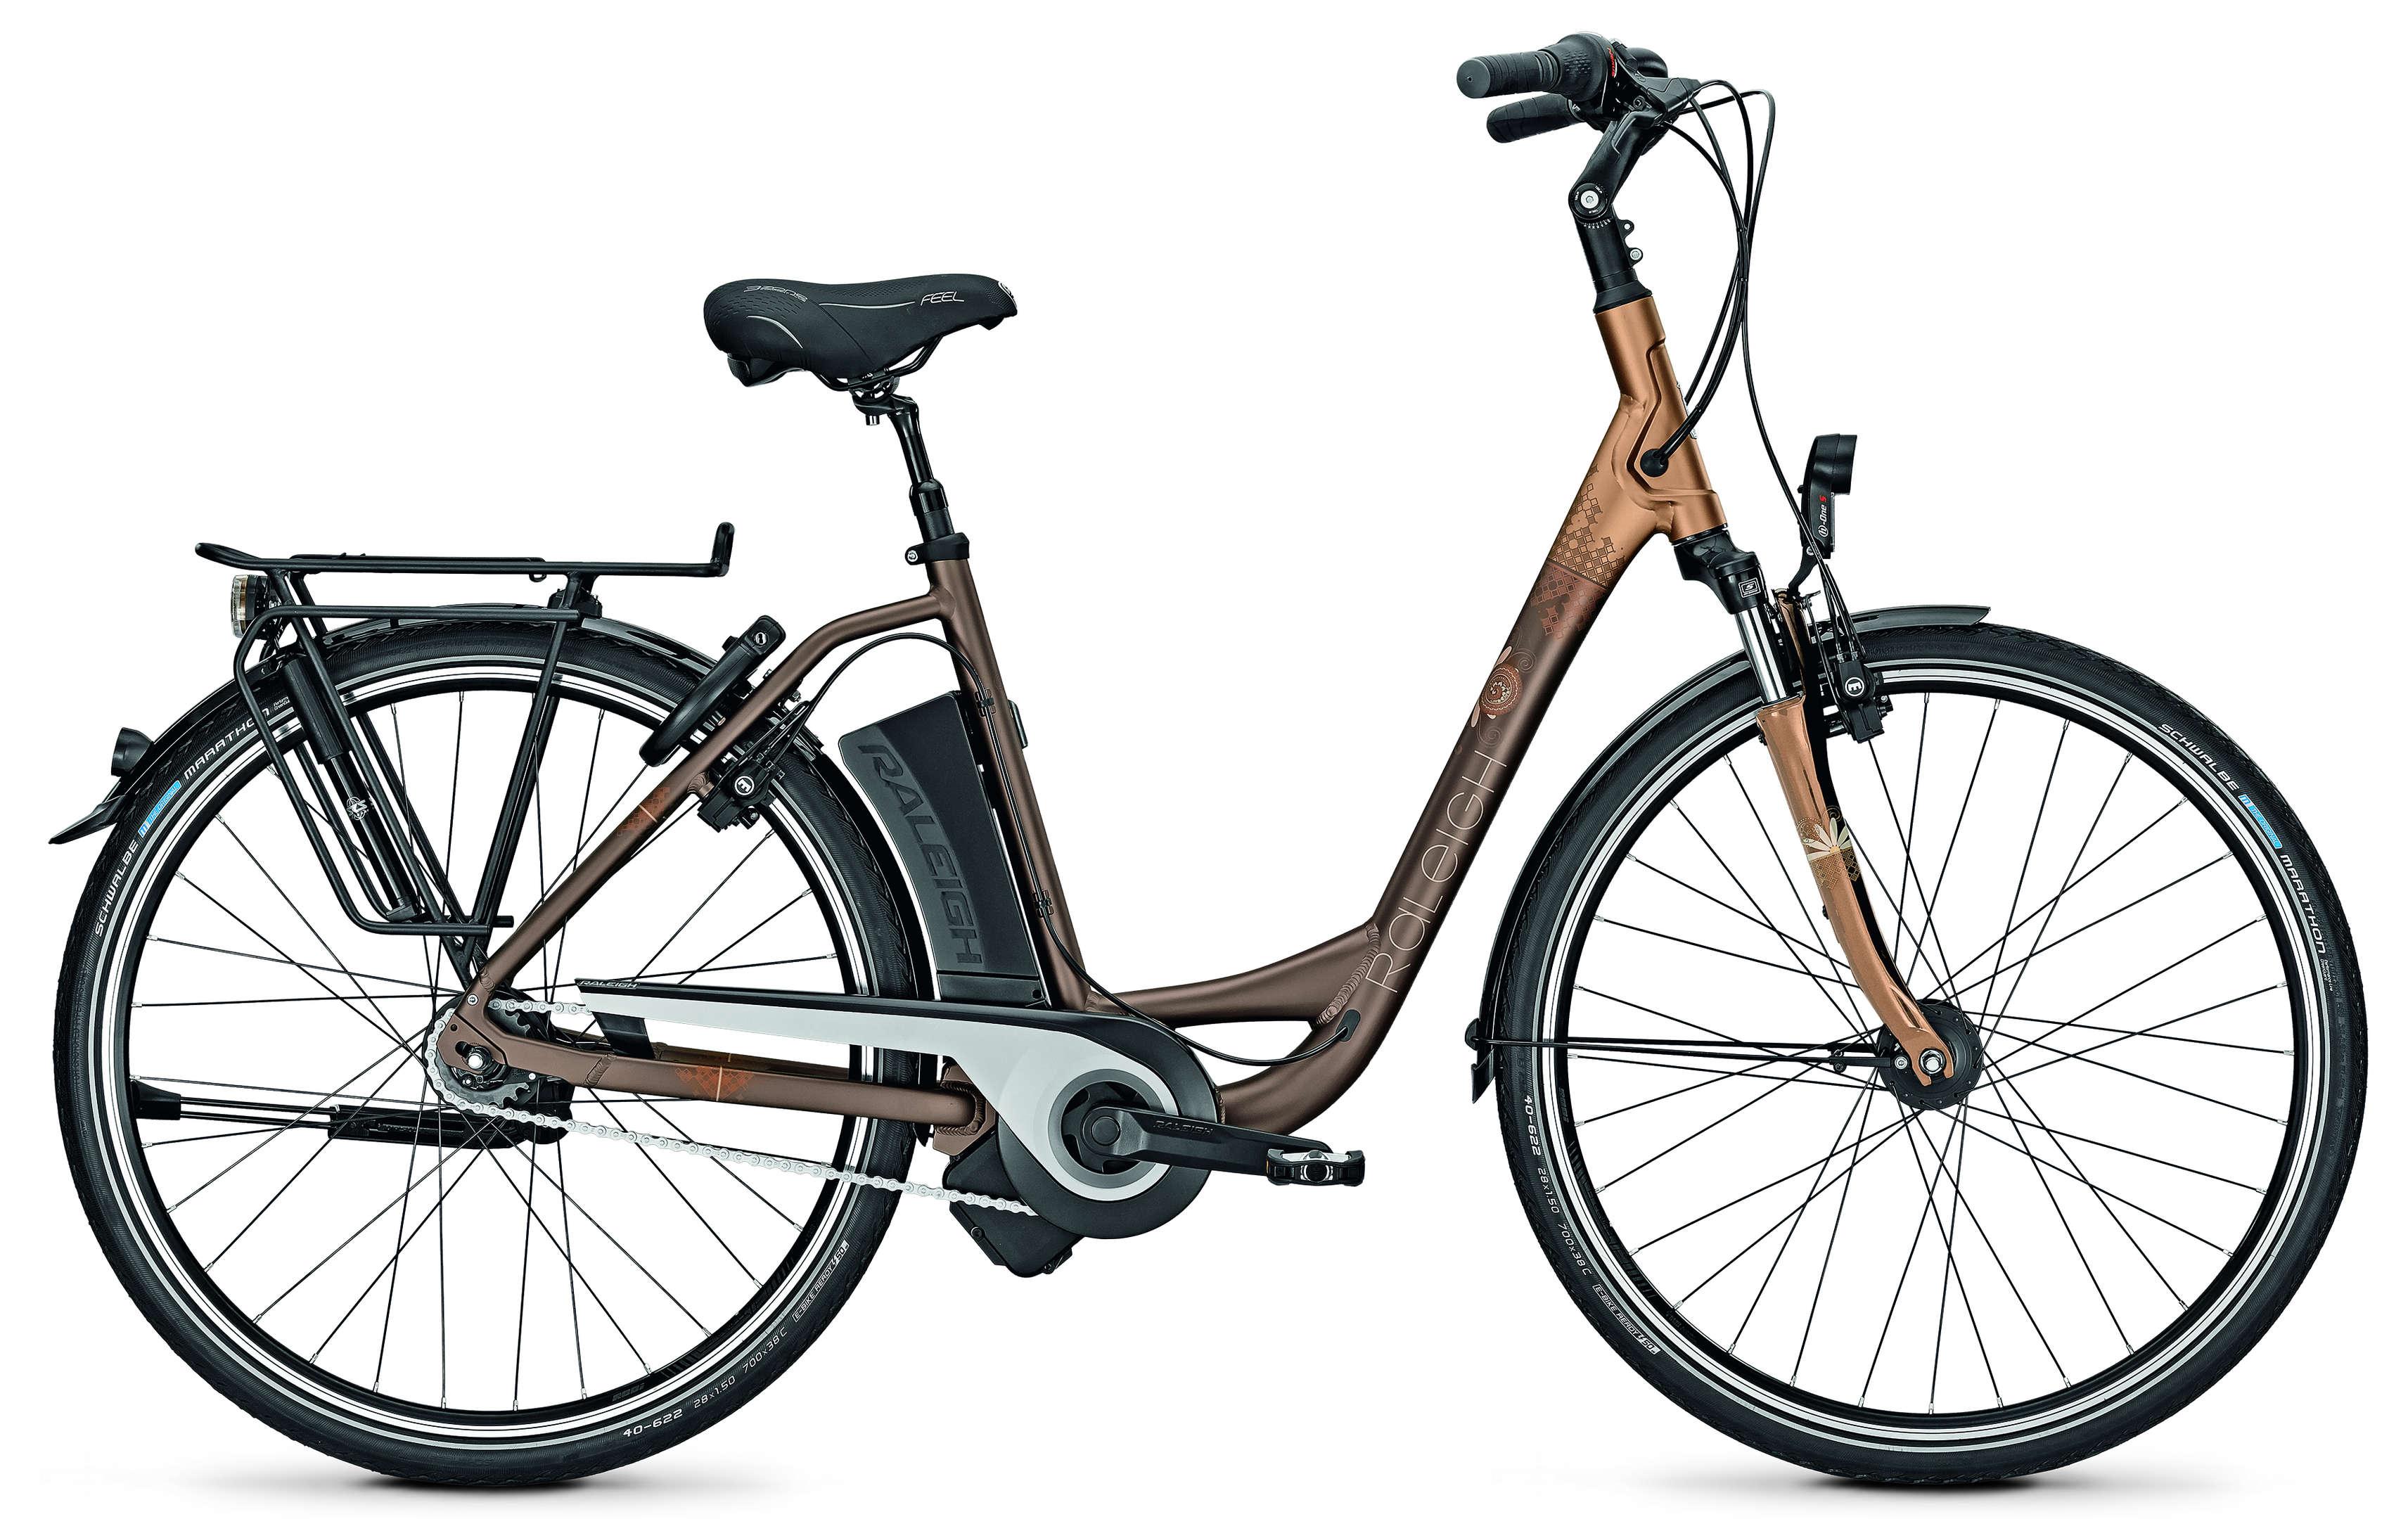 raleigh e bike dover impulse 8 hs hercules bike leasing powered by euroradhercules bike. Black Bedroom Furniture Sets. Home Design Ideas